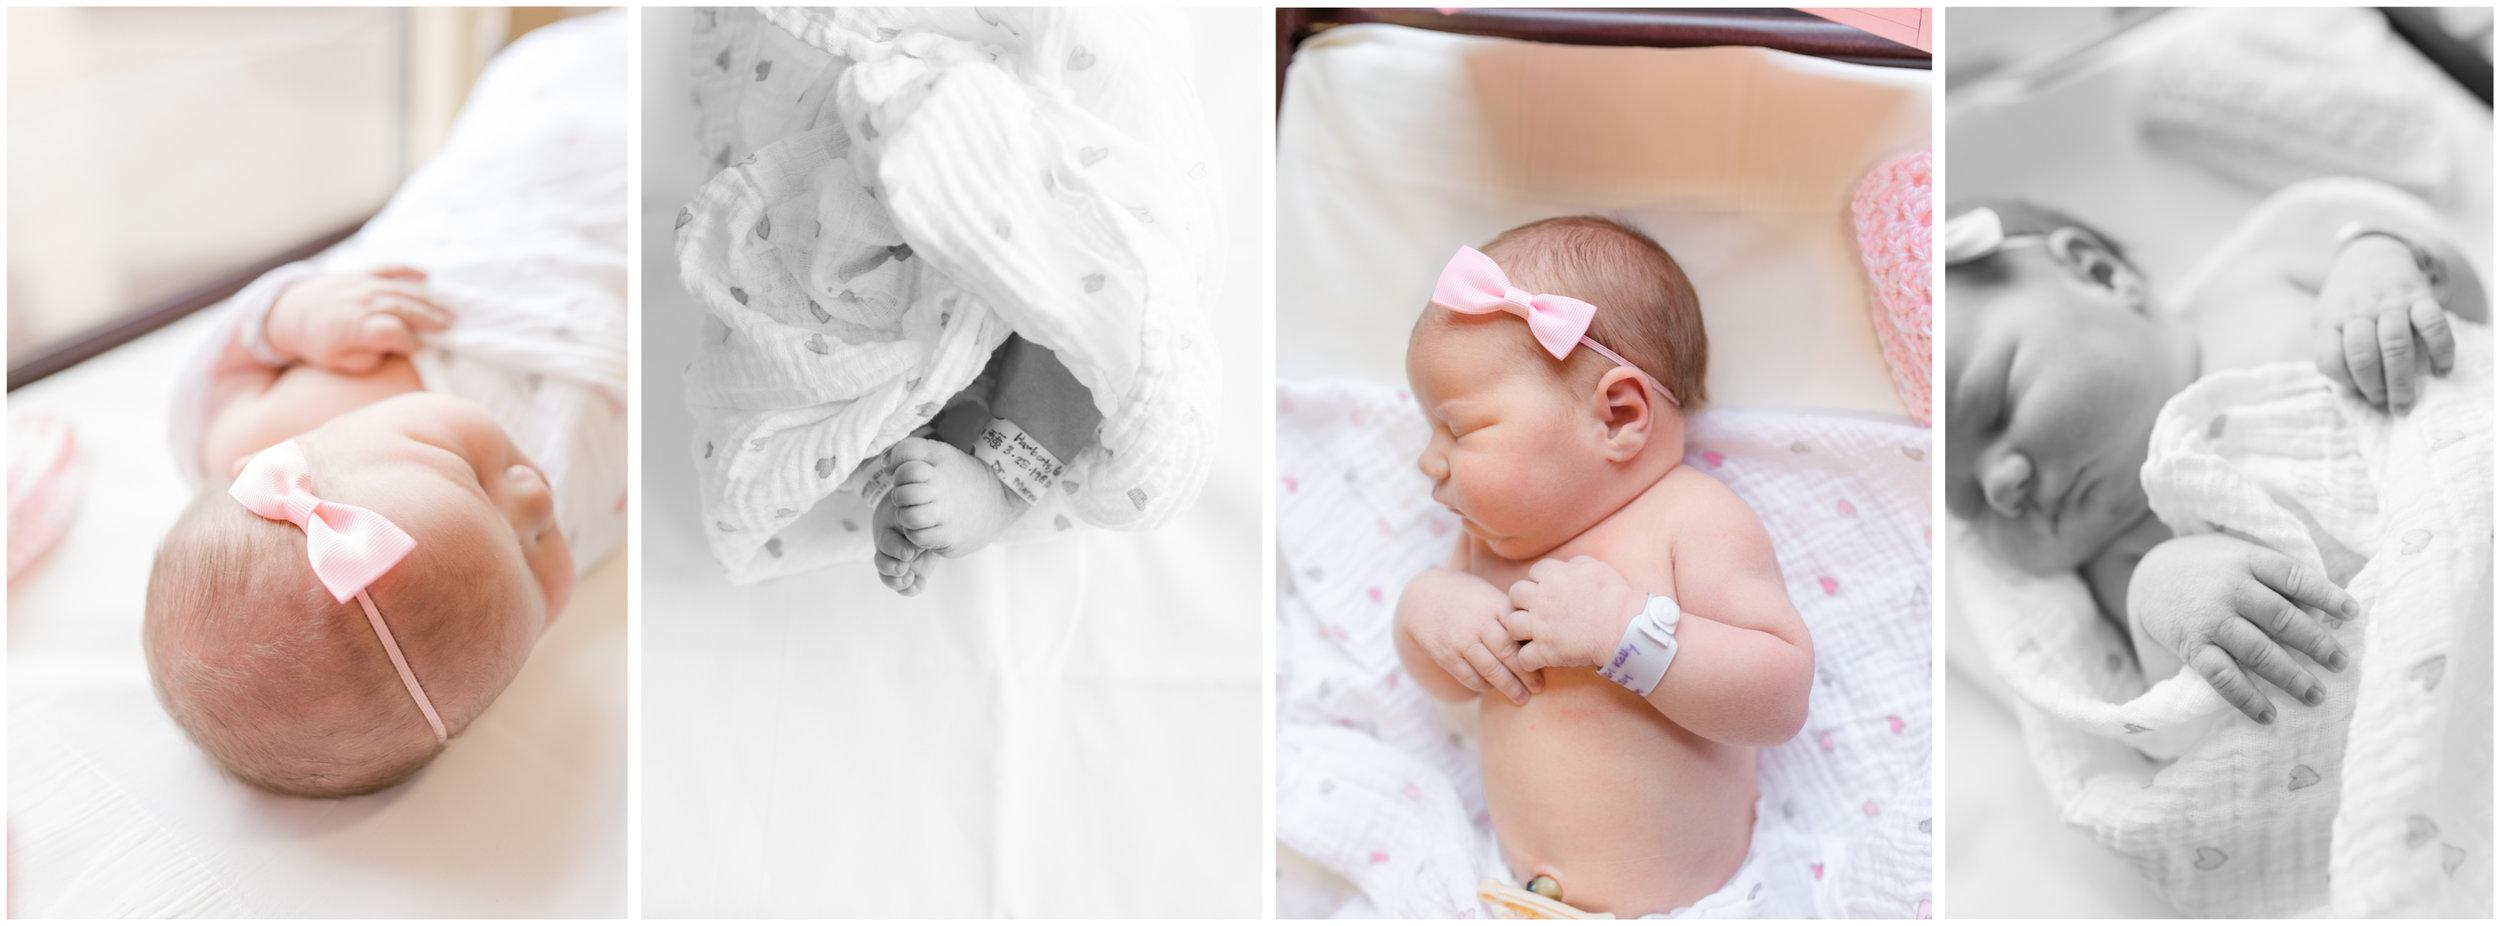 Baby Girl Fresh 48 at Avera Hospital In Sioux Falls South Dakota